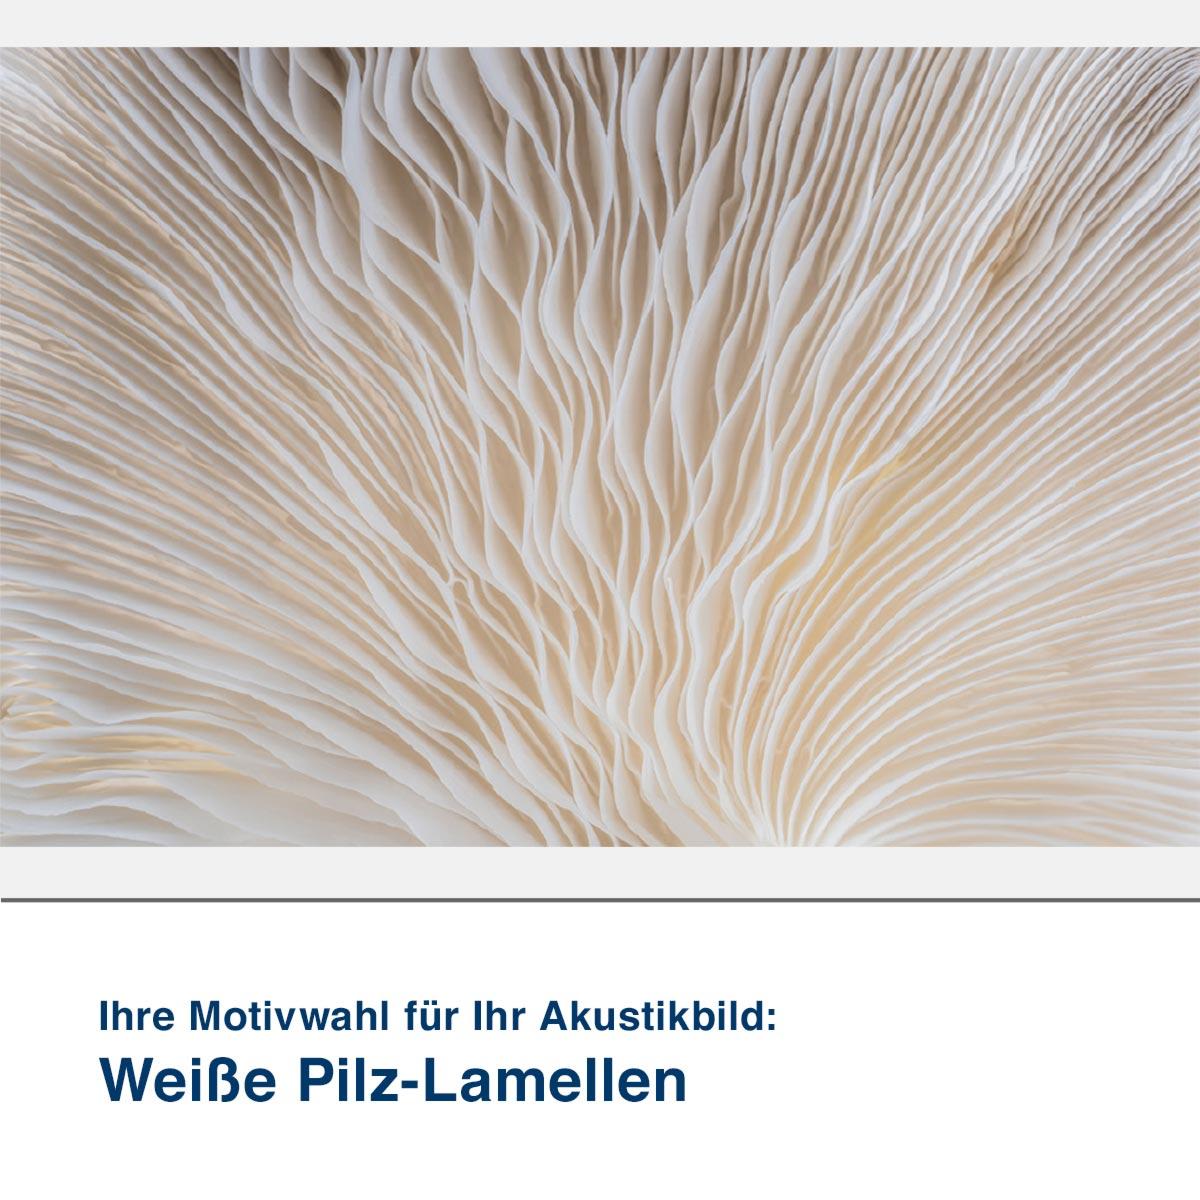 Akustikbild Motiv Weiße Pilz-Lamellen